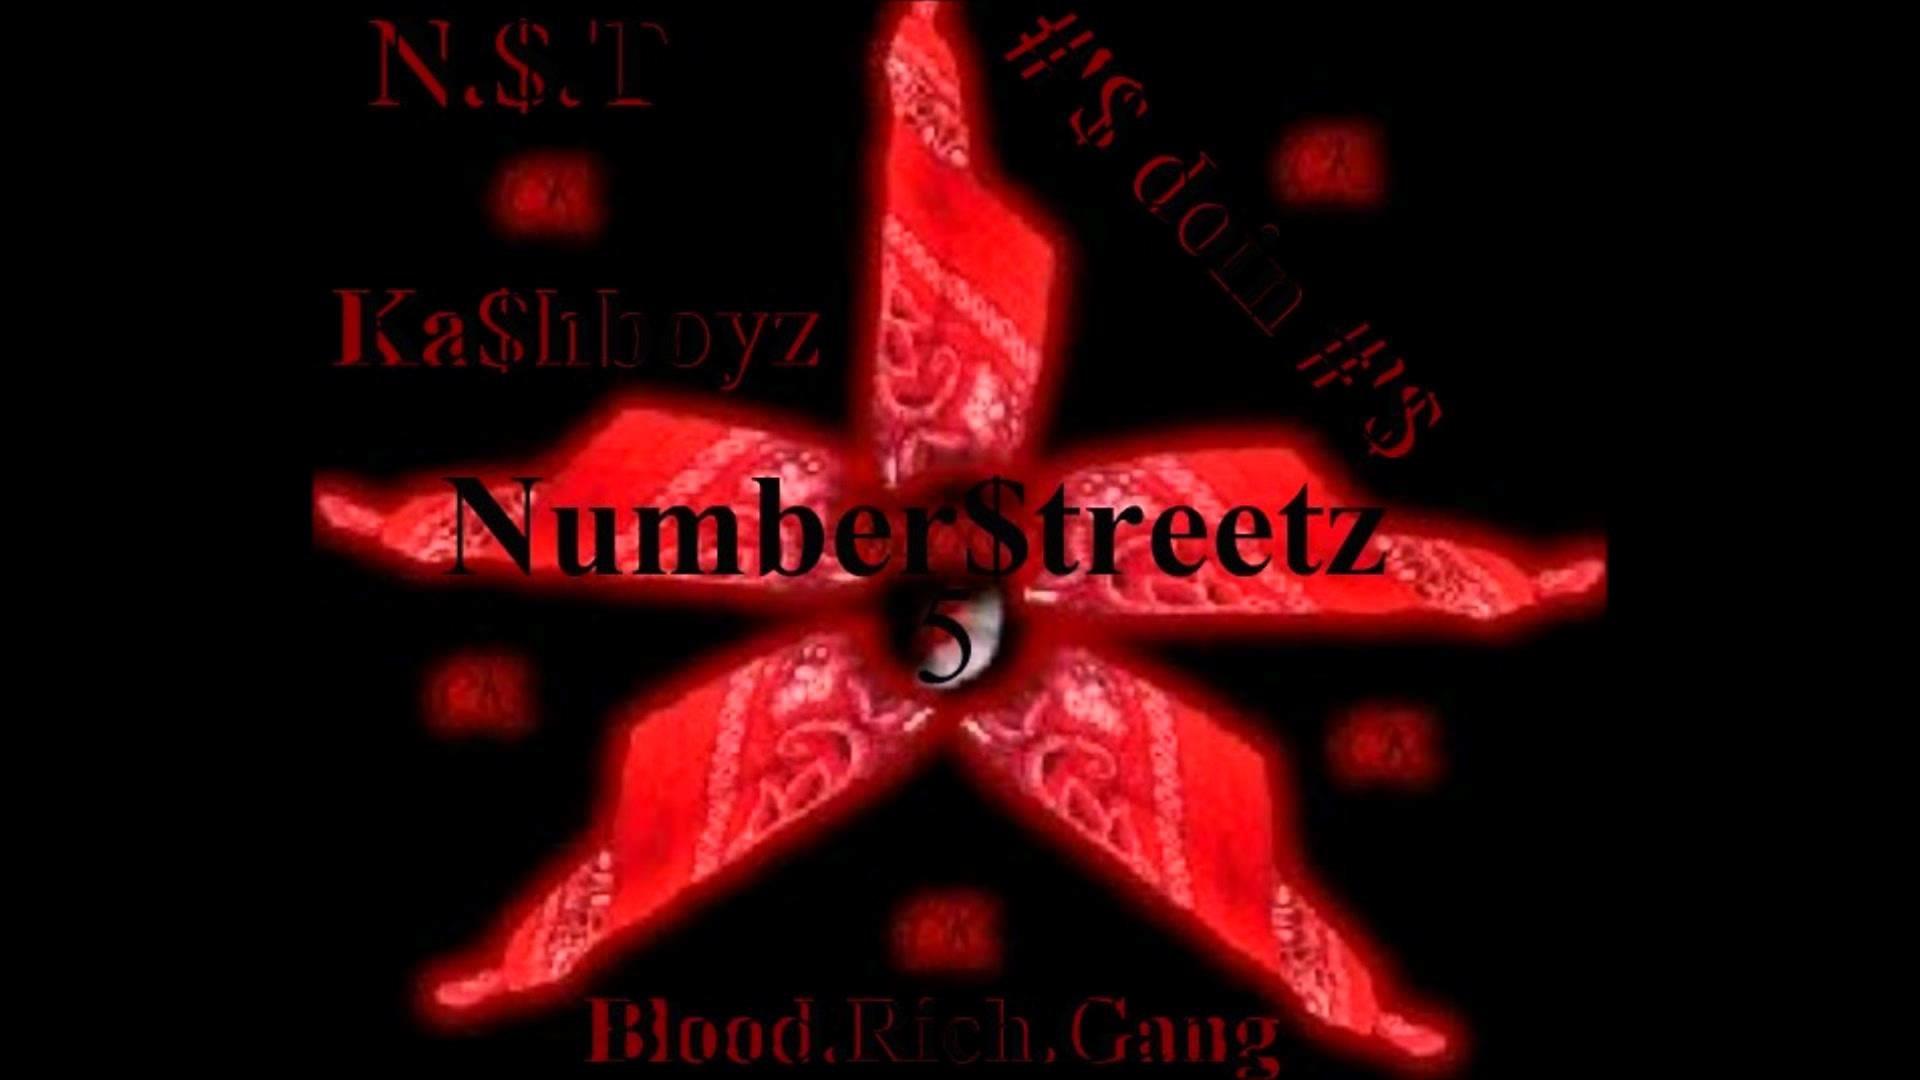 Numberstreet Kashboyz Blood Rich Gang